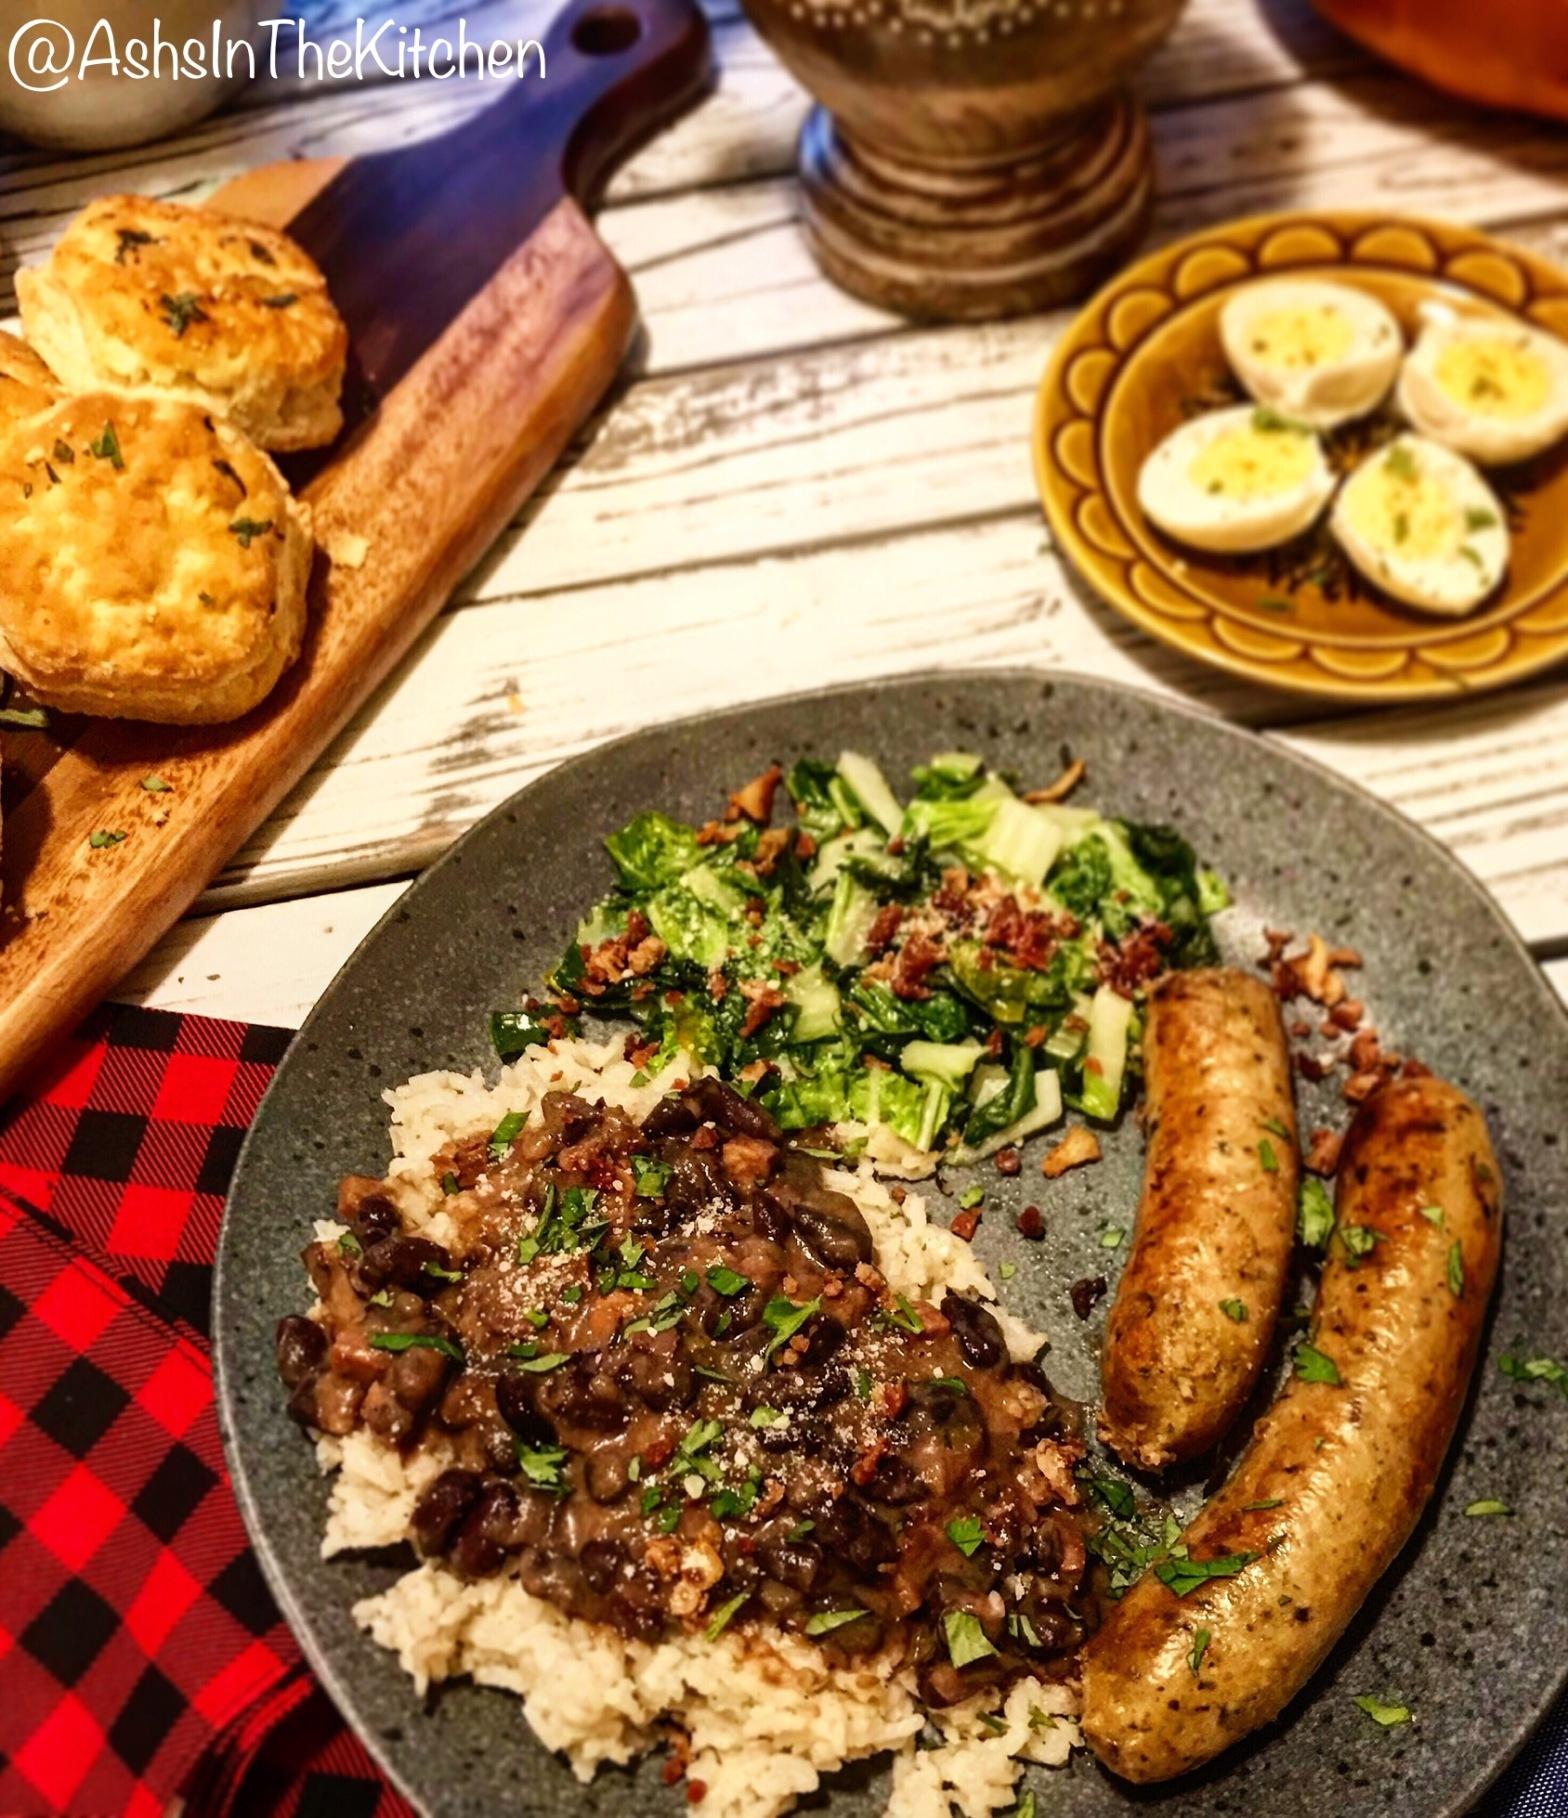 Louisiana Cajun Creole Pork Boudin Recipe by Ash's In The Kitchen